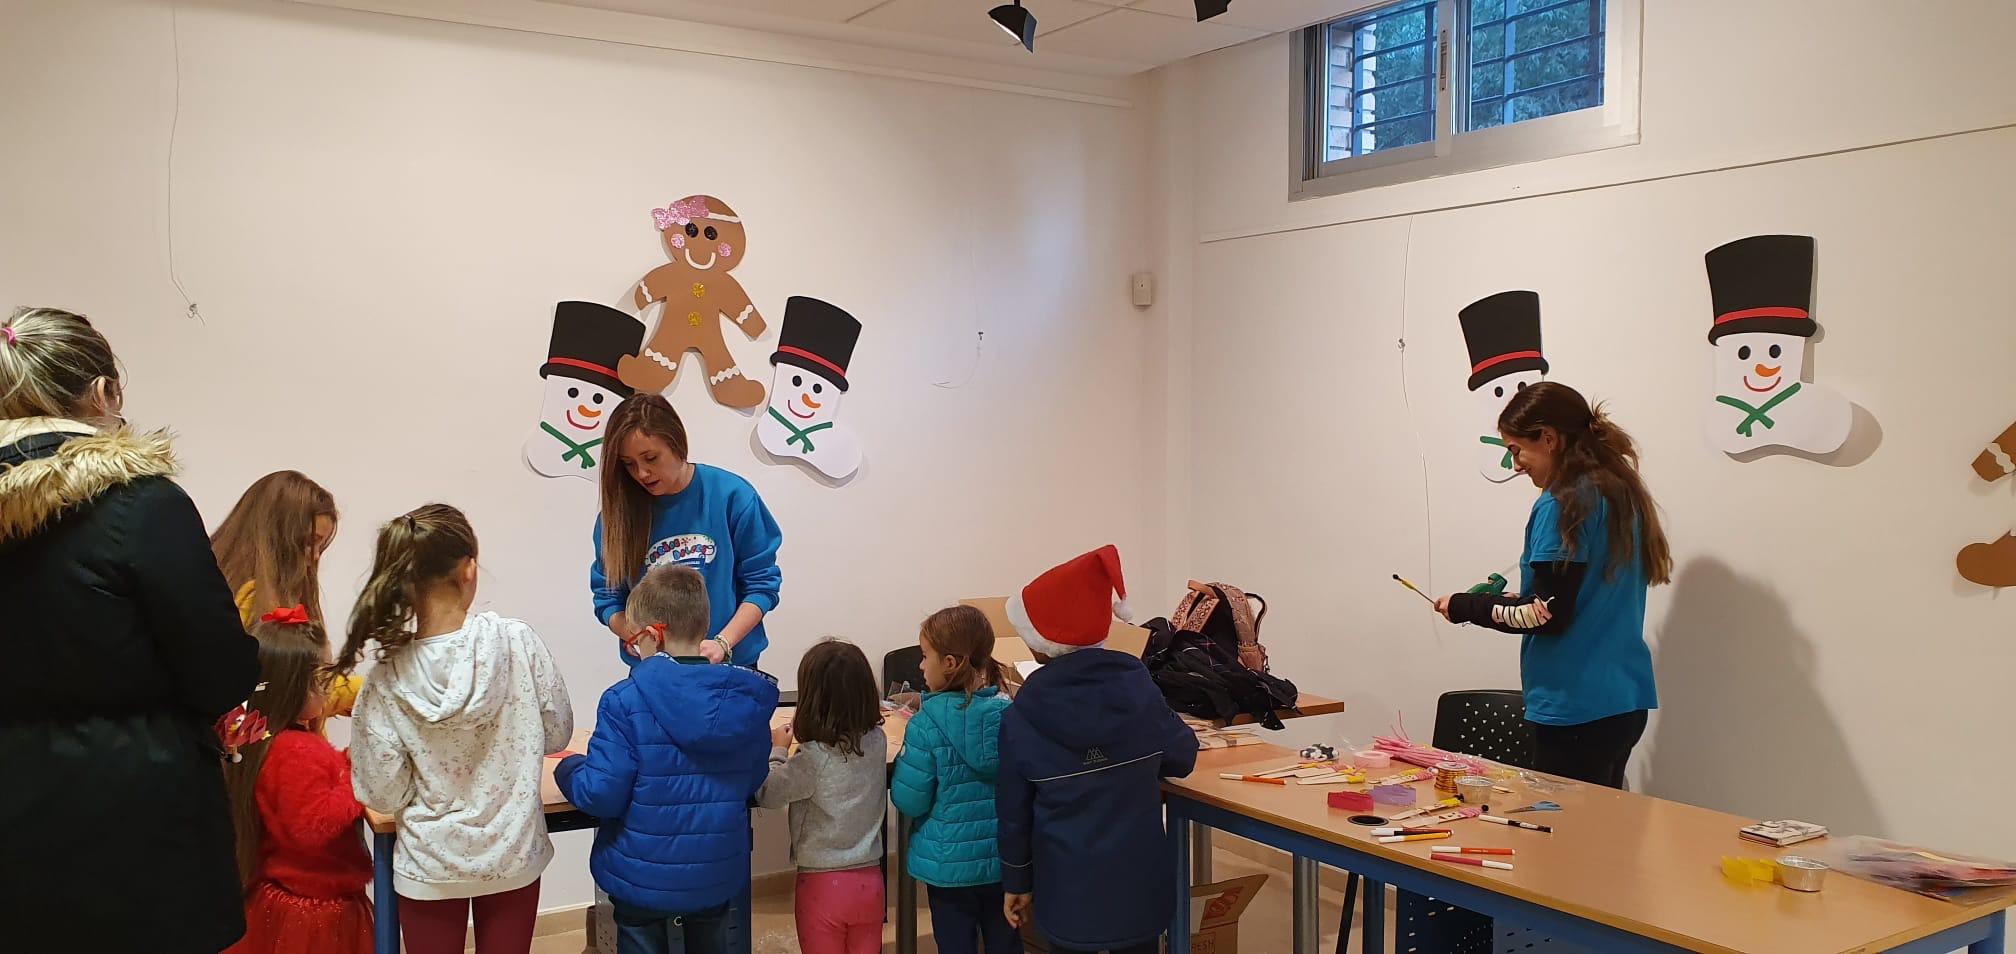 Cúllar Vega enseña a sus niños a preparar adornos navideños con materiales reciclados